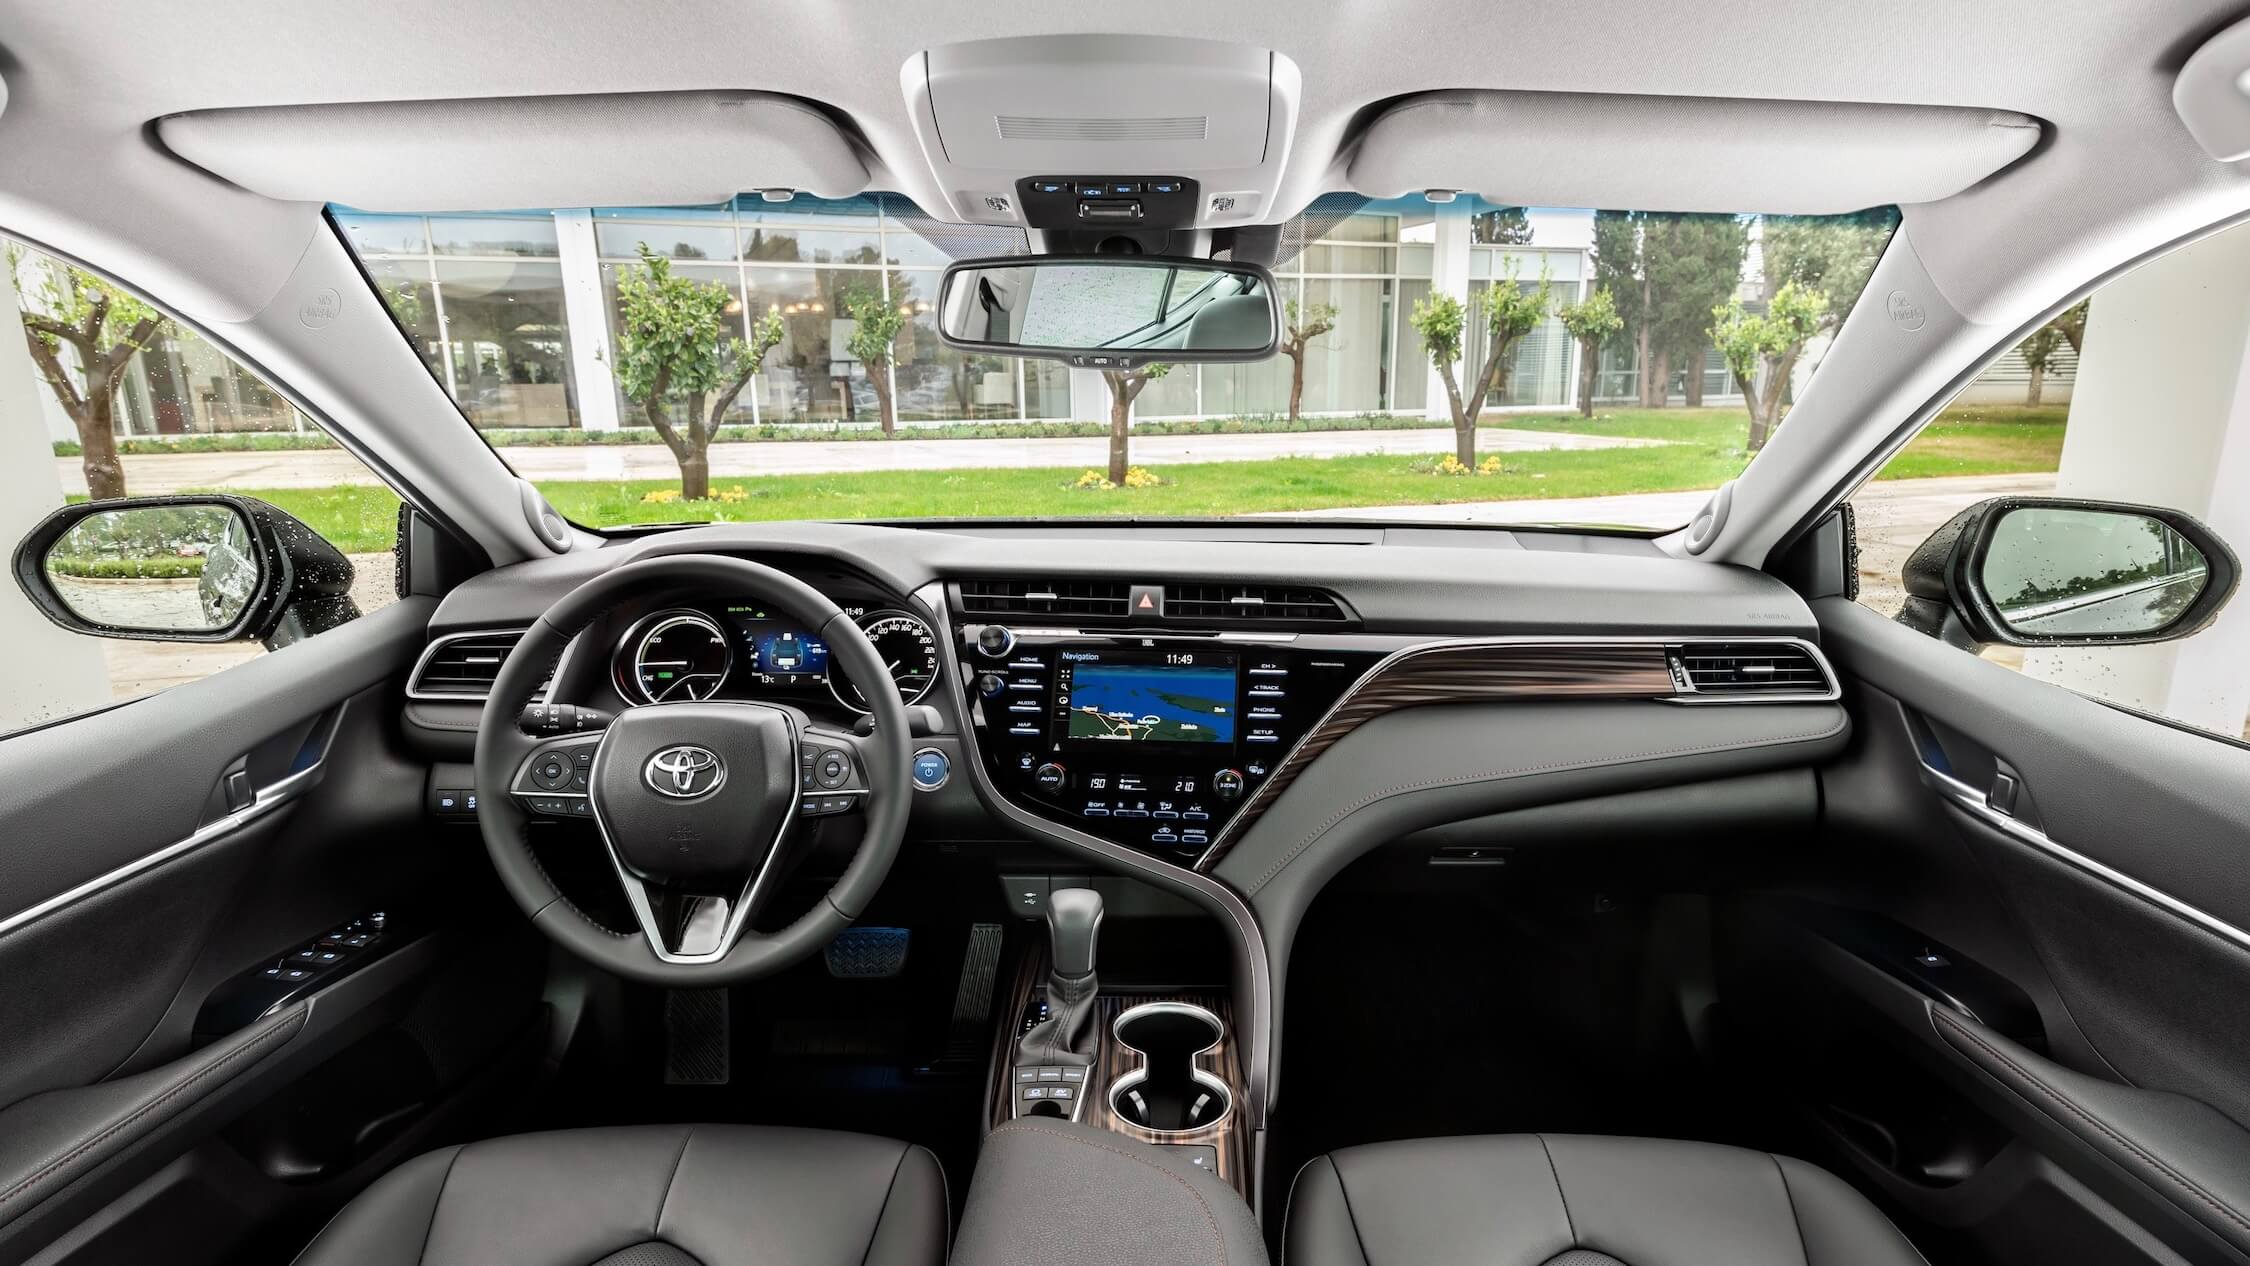 Toyota Camry hibrido interior